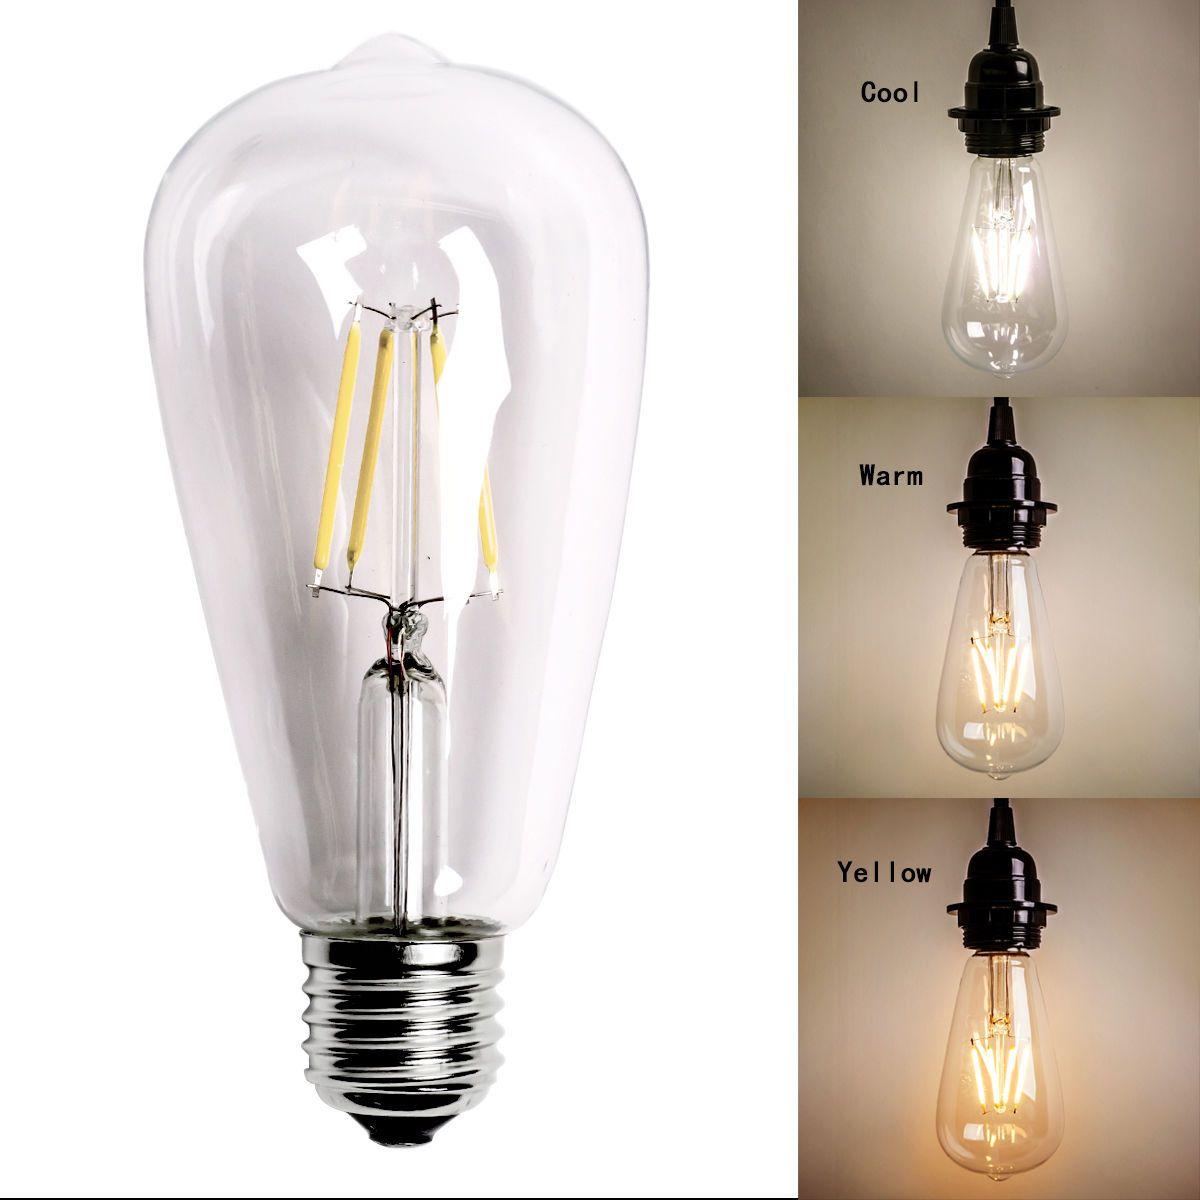 Vintage Edison E27 E26 Screw Led Filament Light Useful Bulb St64 2 Types Ebay Filament Bulb Lighting Vintage Led Bulbs Vintage Edison Bulbs